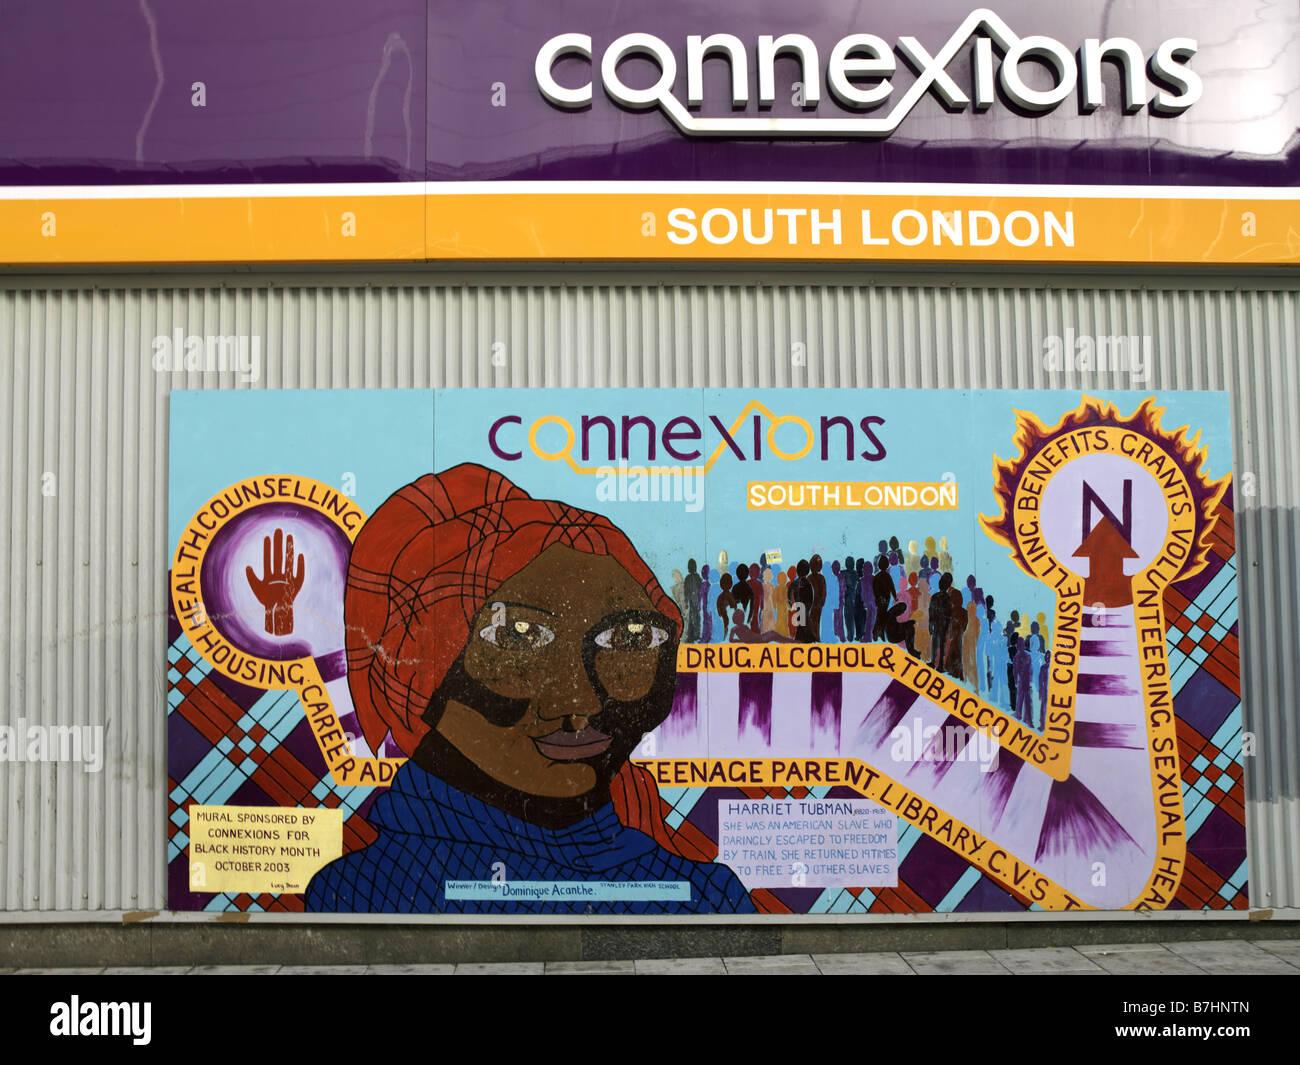 Connexions Sponsored Mural on Black History Harriet Tubman Slave Heroine - Stock Image